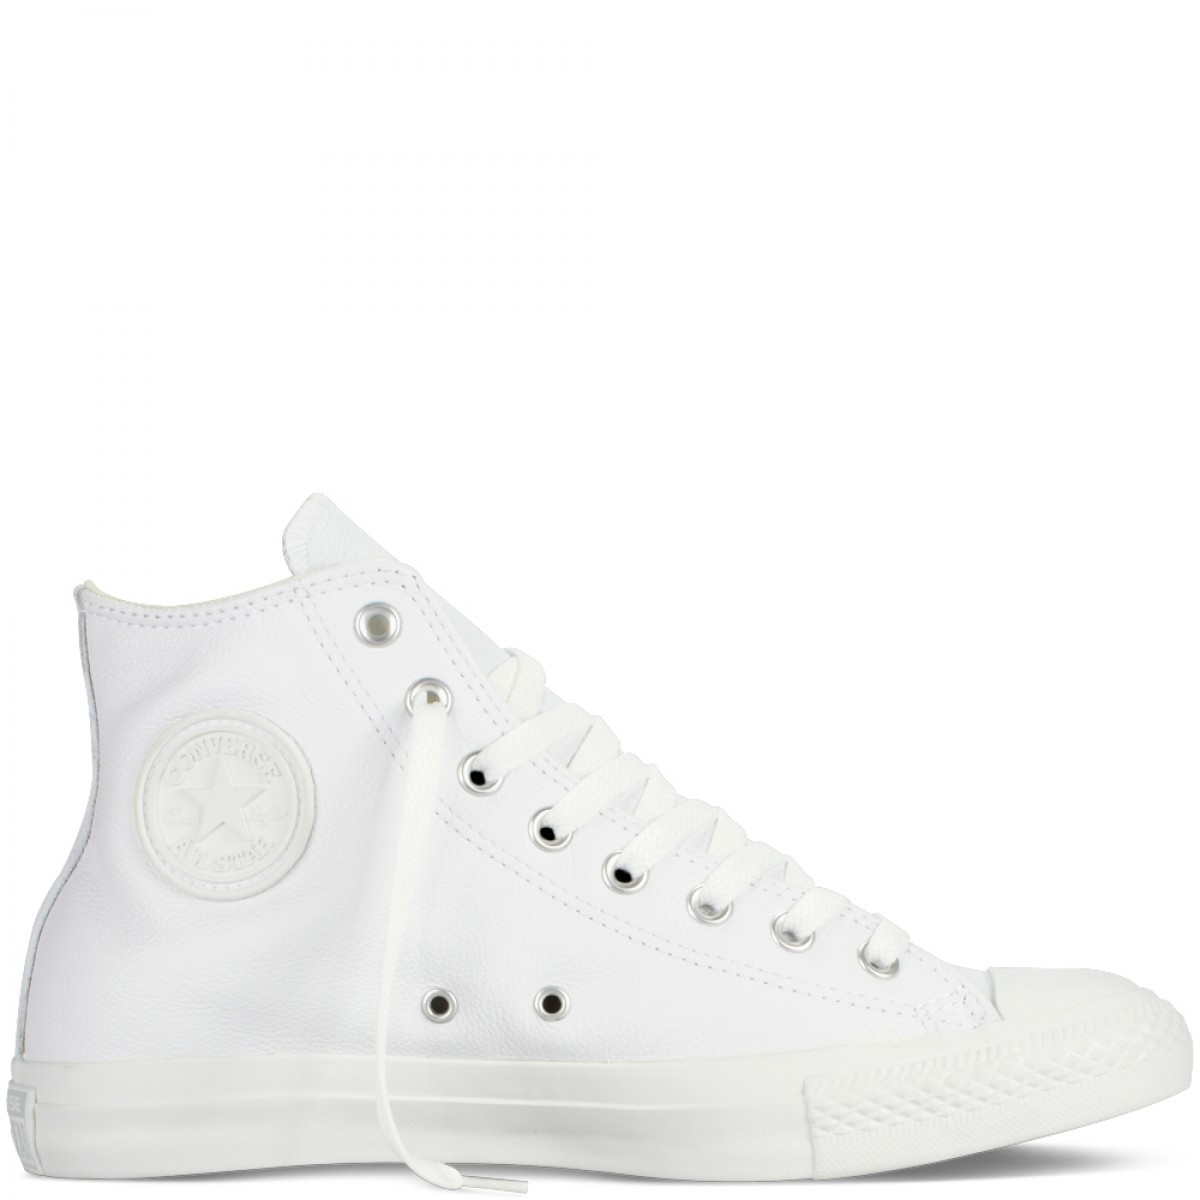 Converse Chuck Taylor All Star Leather Hi White Monochrome 1T406